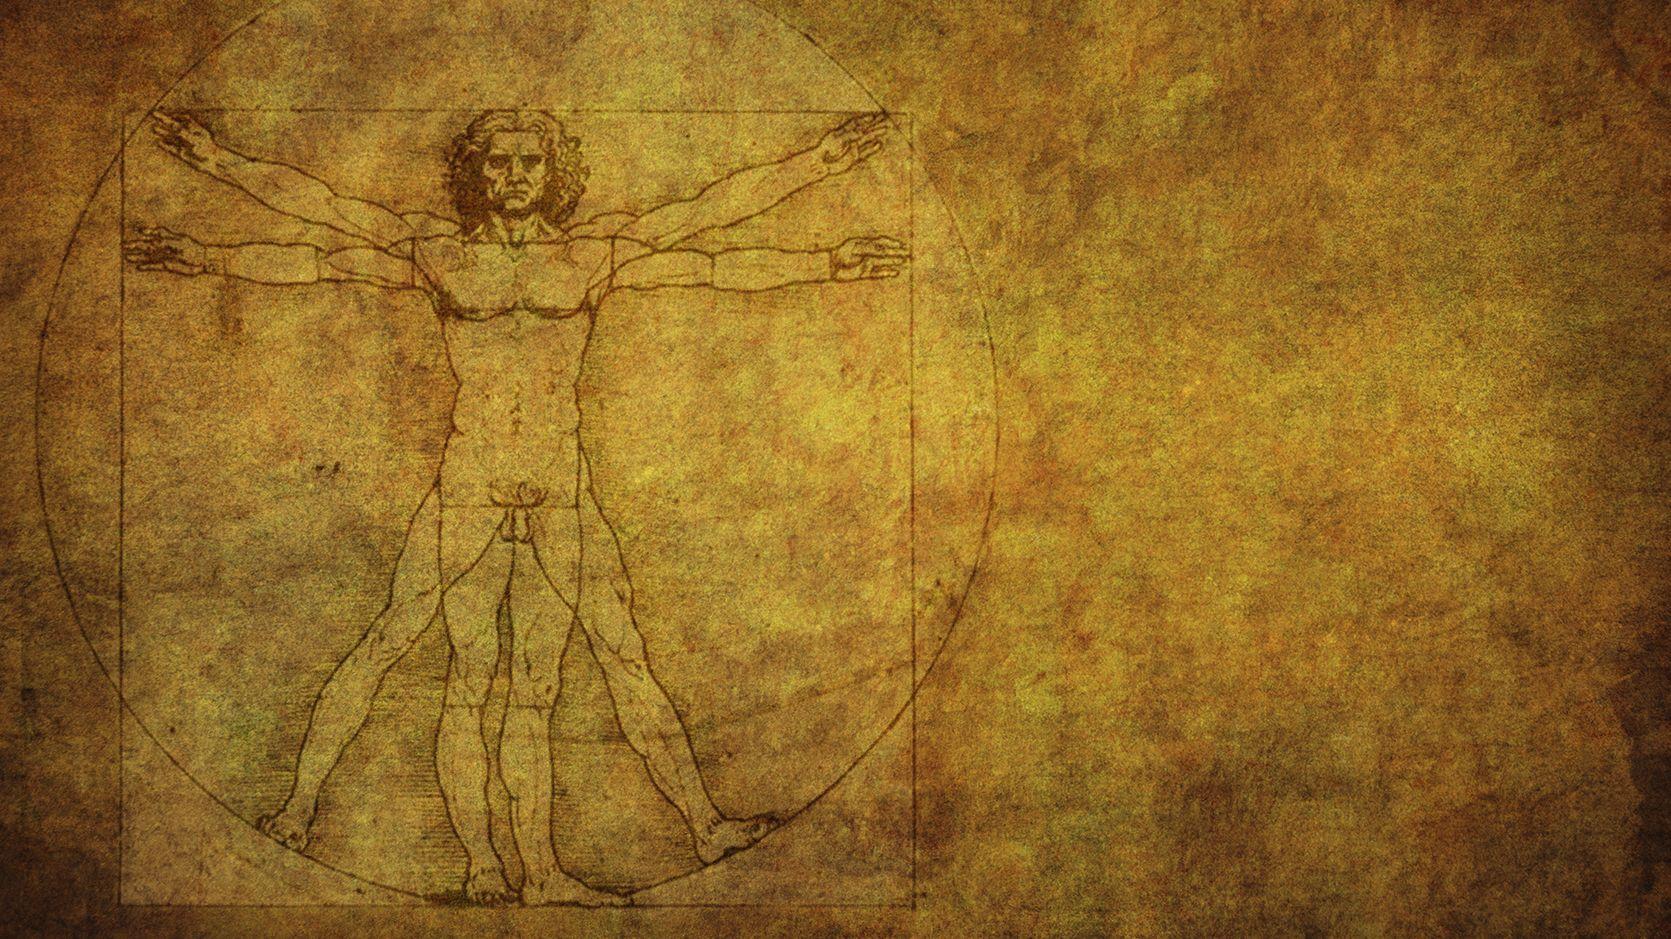 15 Things You Might Not Know About Leonardo da Vinci's Vitruvian Man